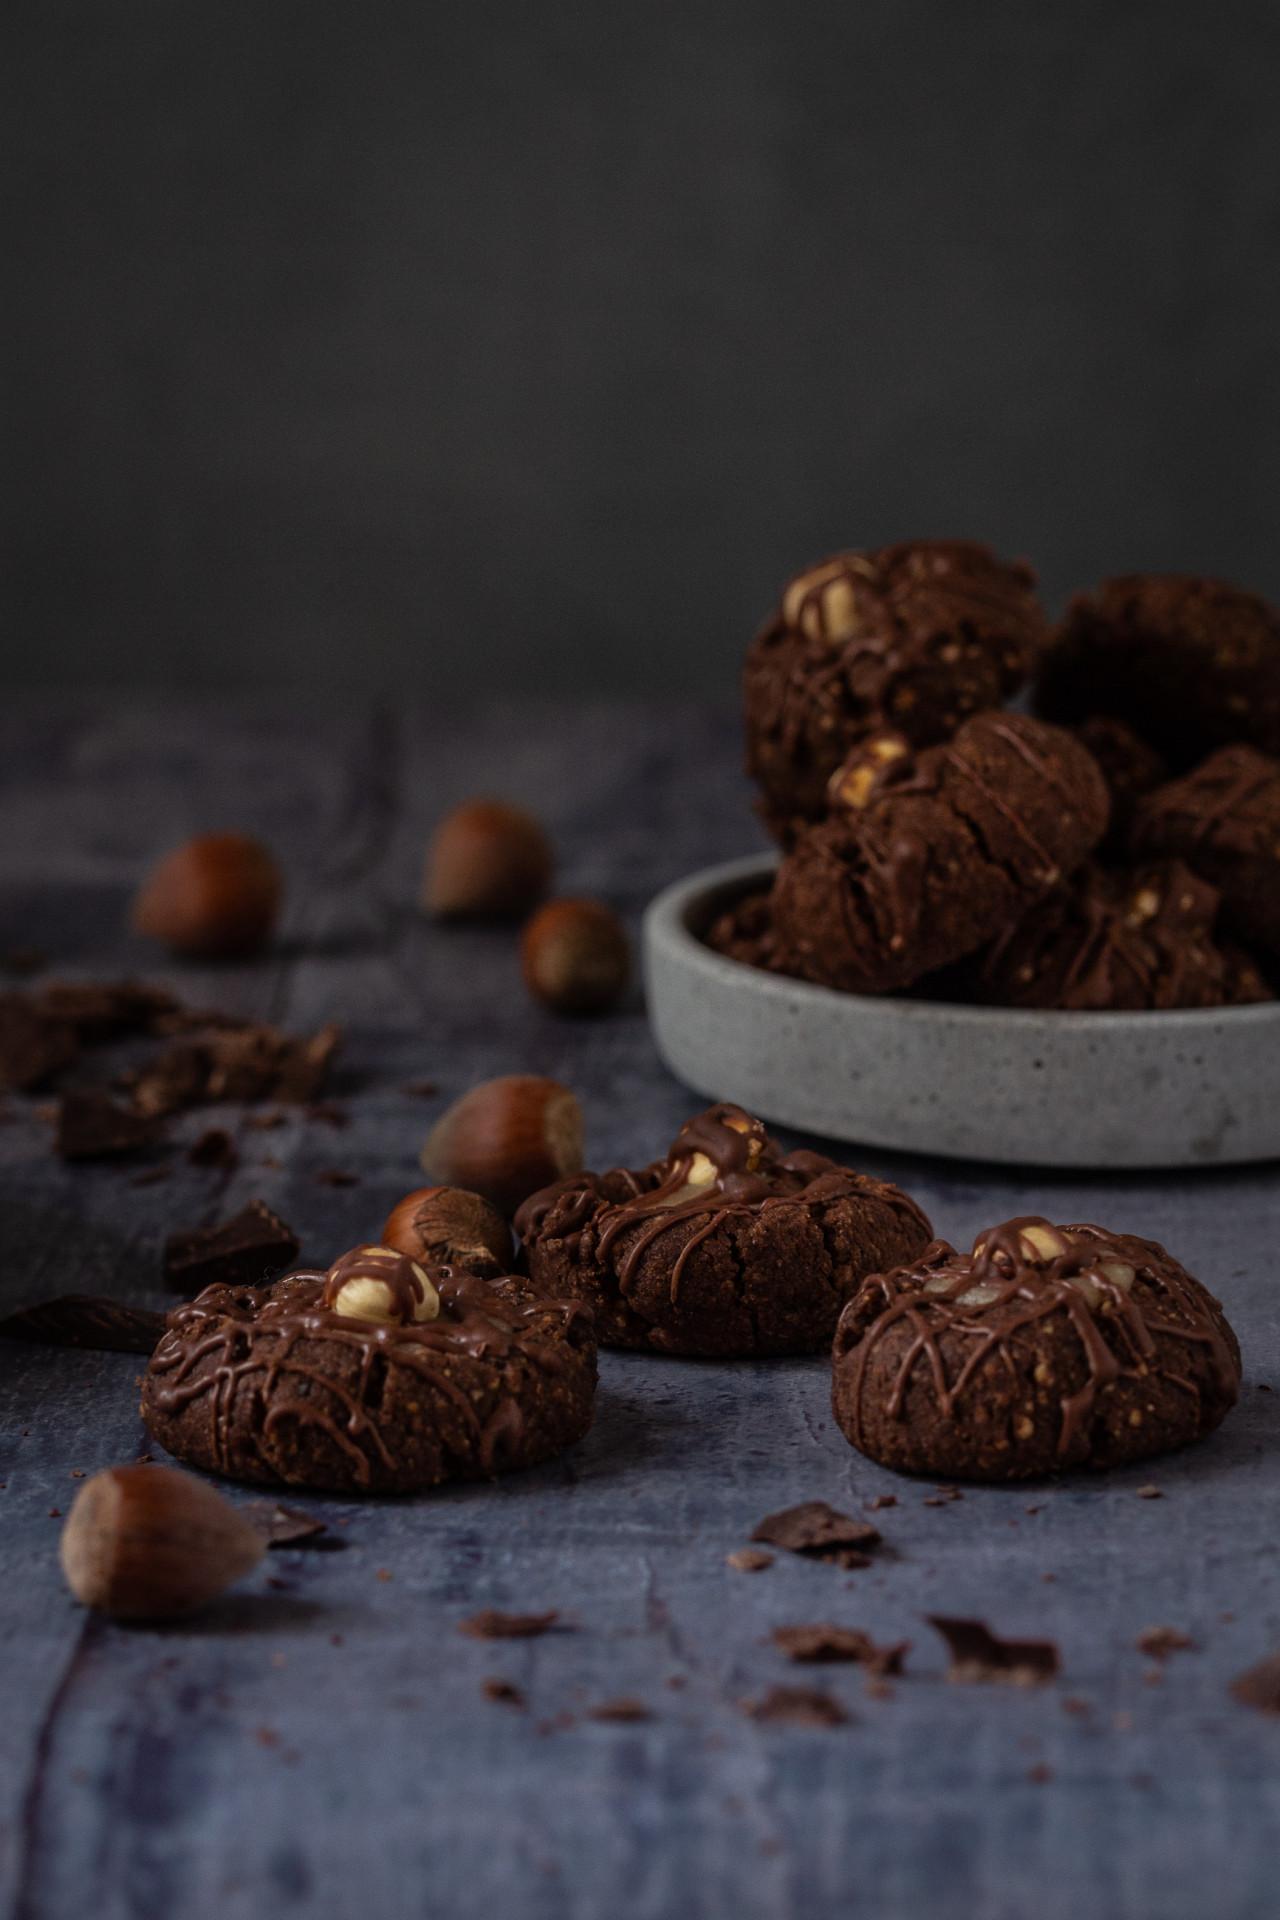 Haselnuss-Schokoladentaler mit Karamellfüllung